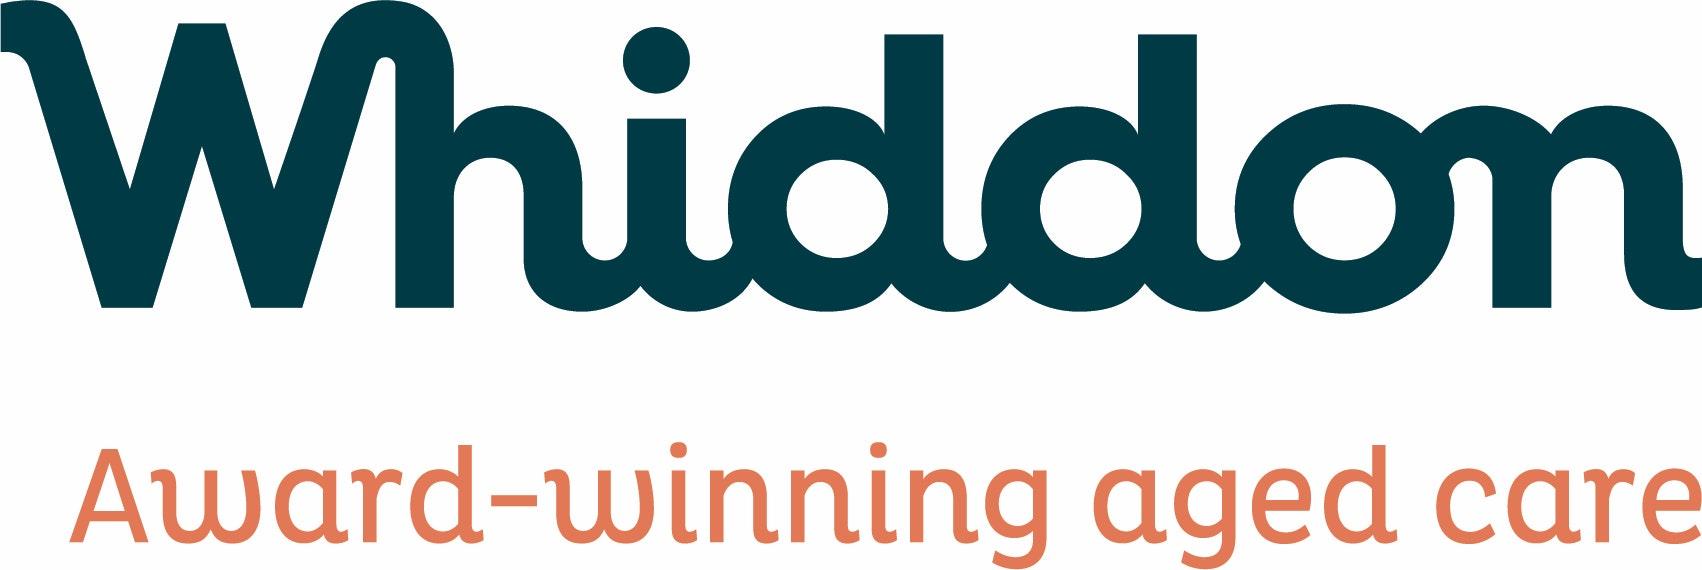 Whiddon Hornsby logo